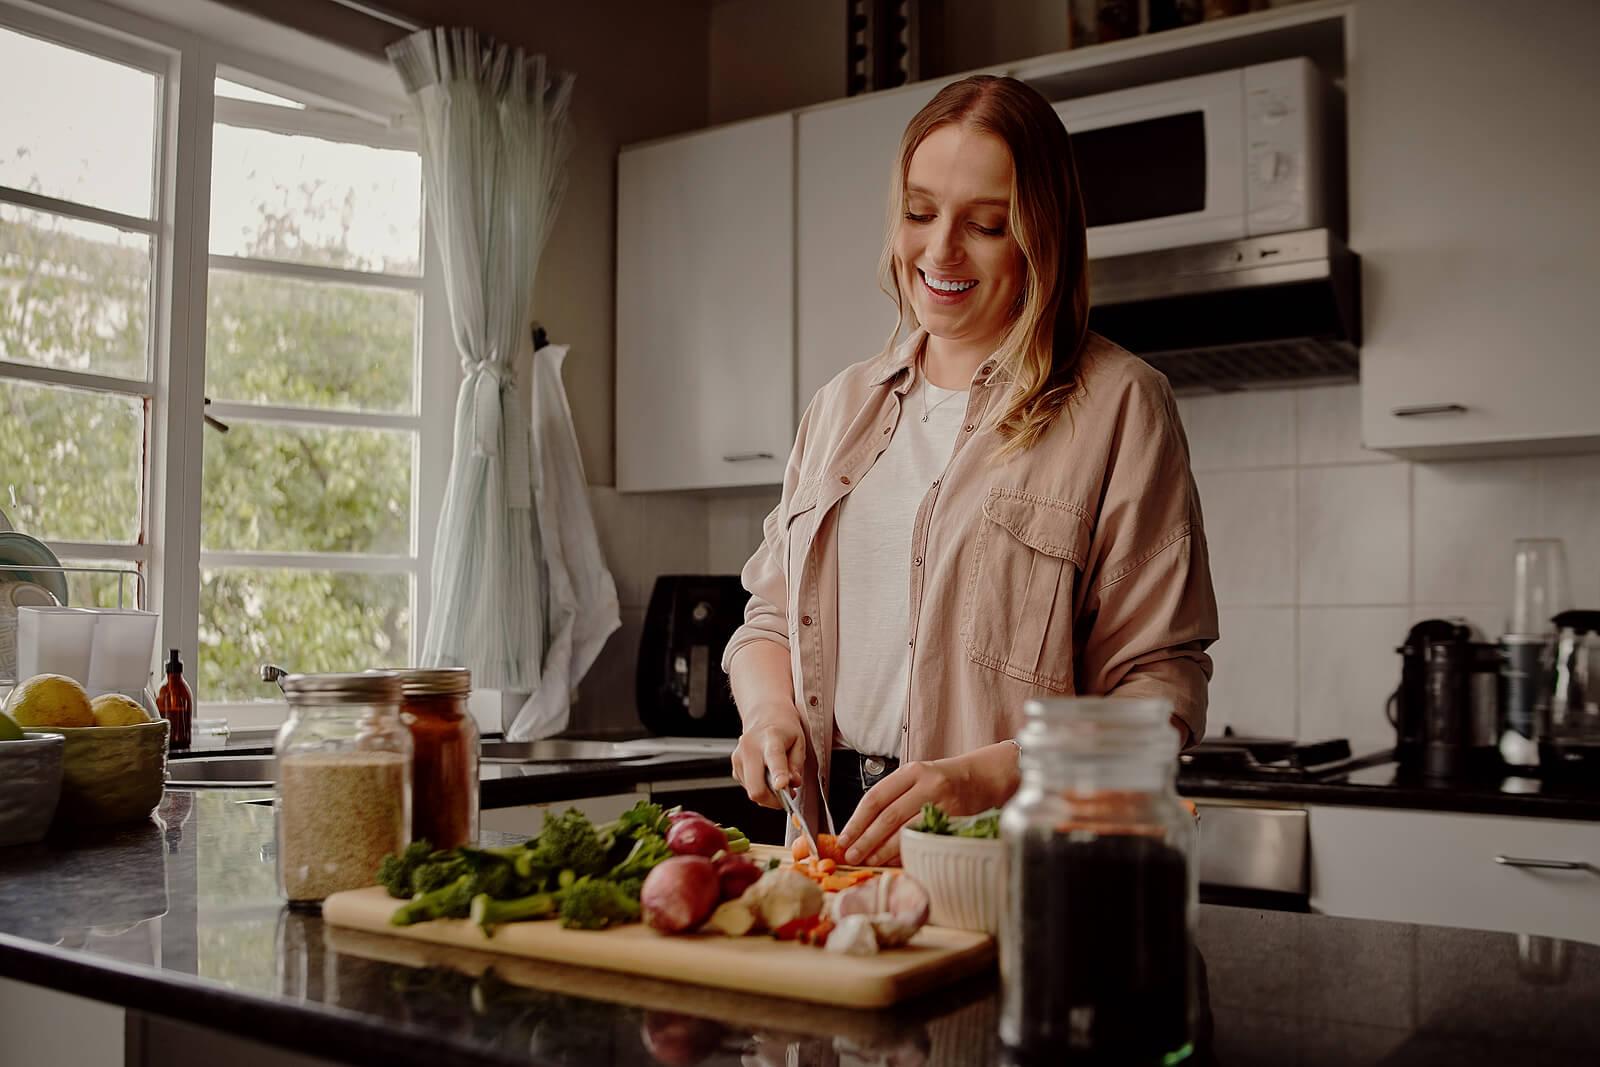 Mujer preparando la cena.